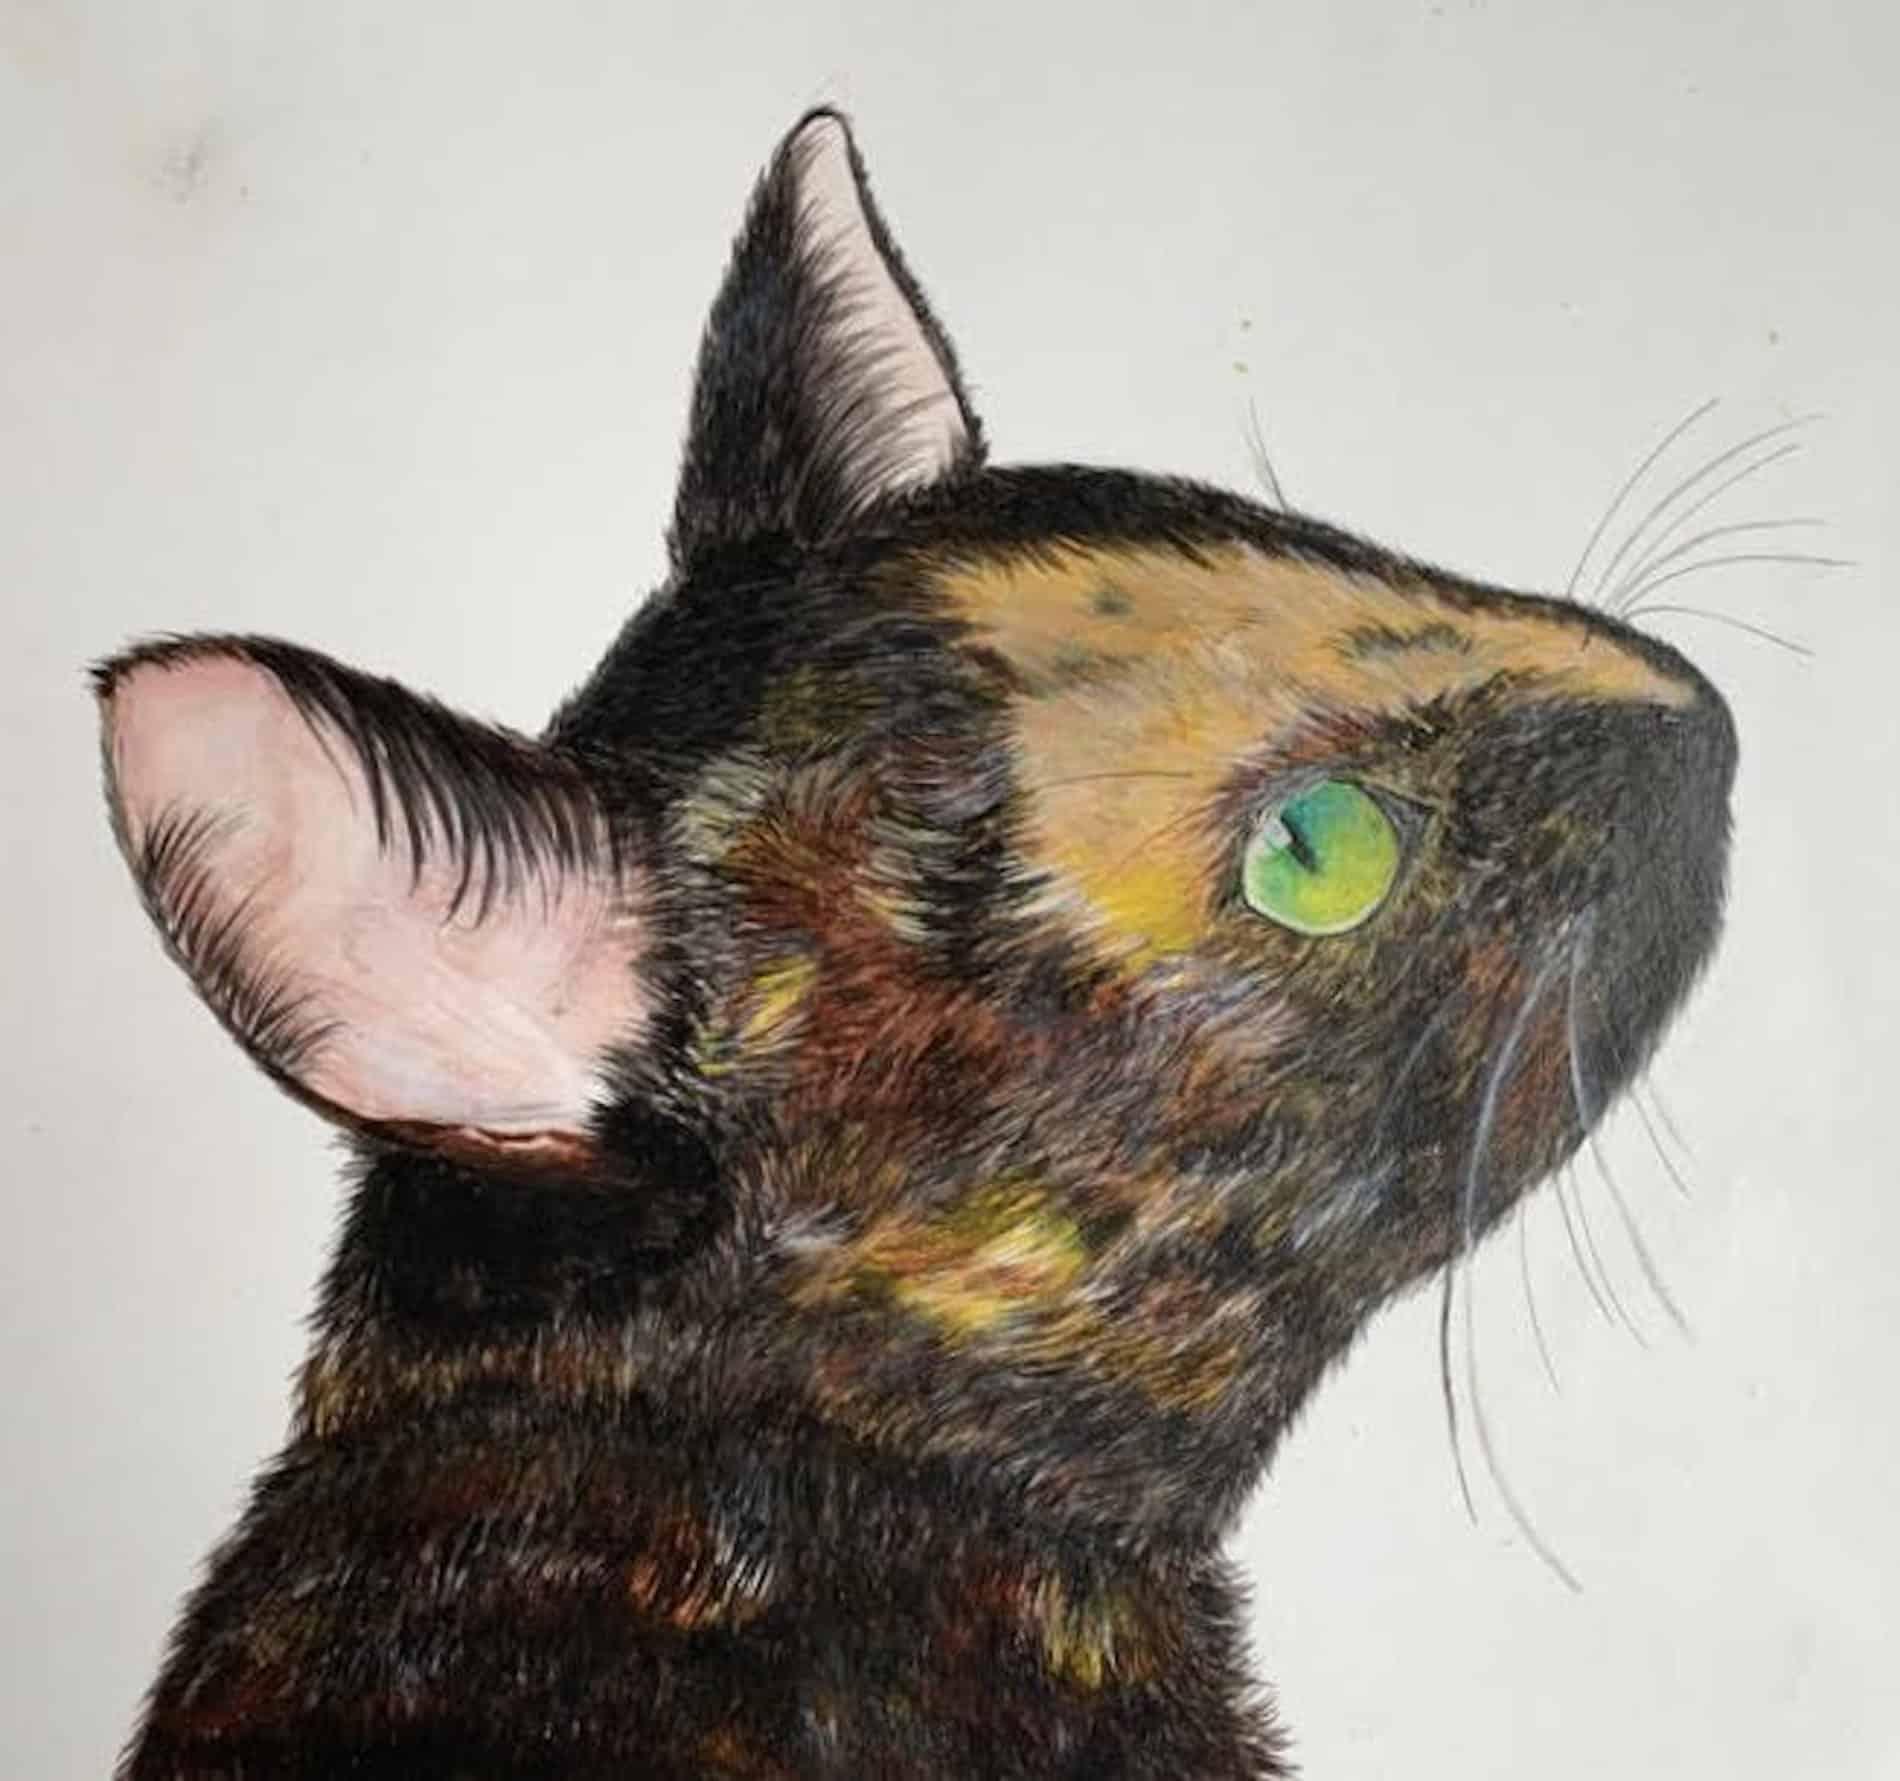 mauritius-arts-priya-jhugroo-cat-painting